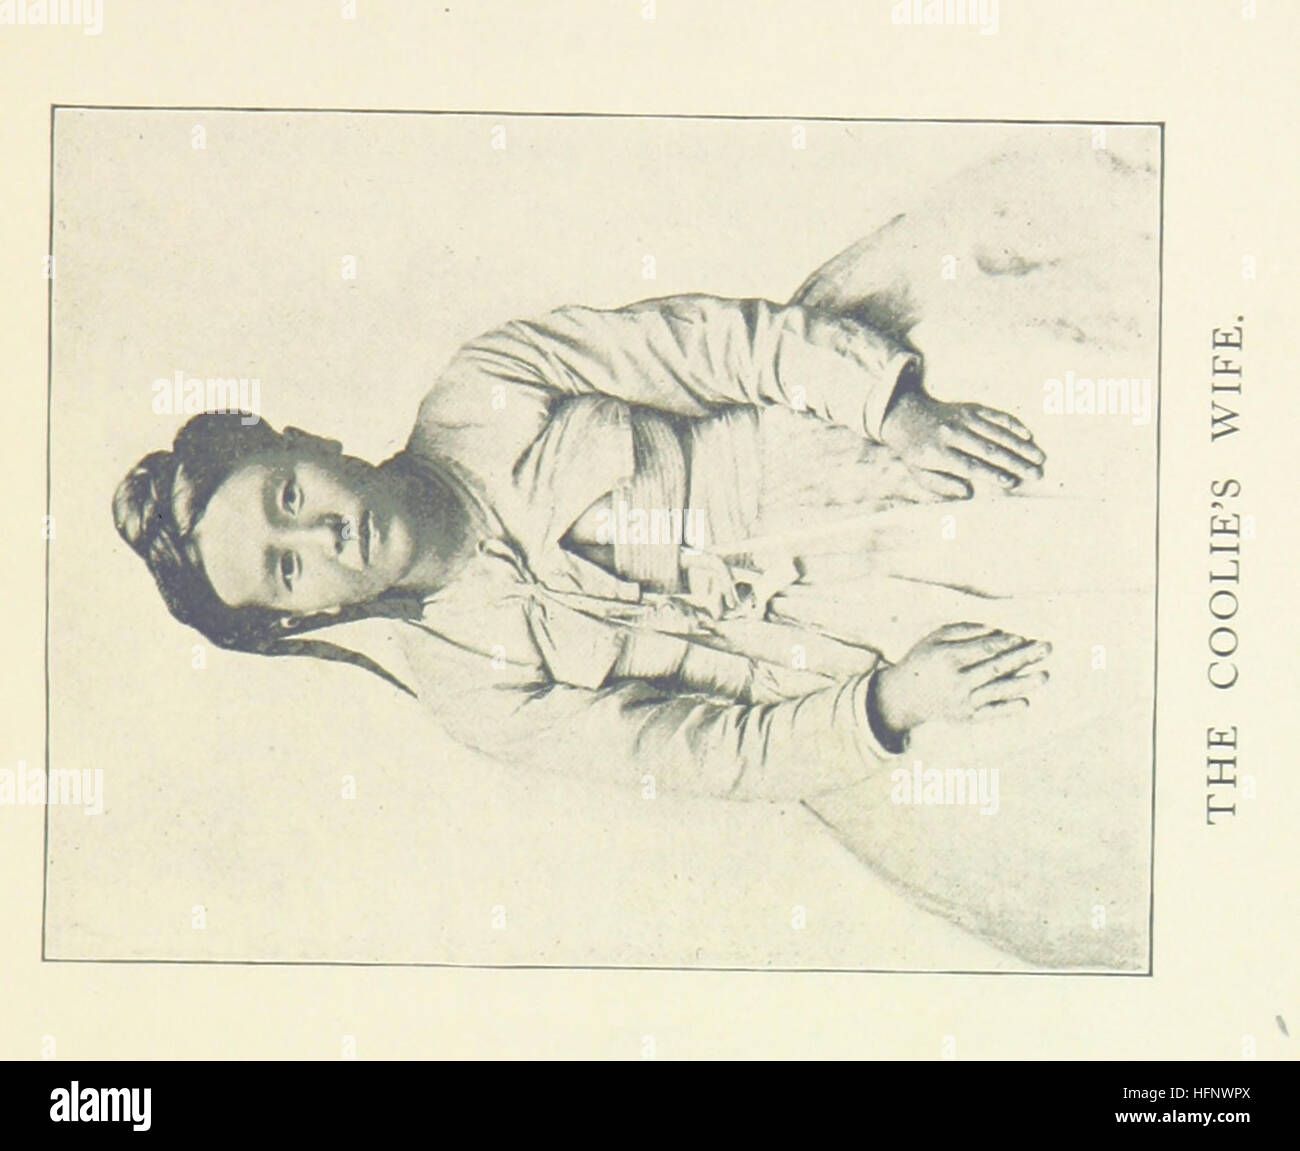 Korean Sketches Image taken from page 61 of 'Korean Sketches